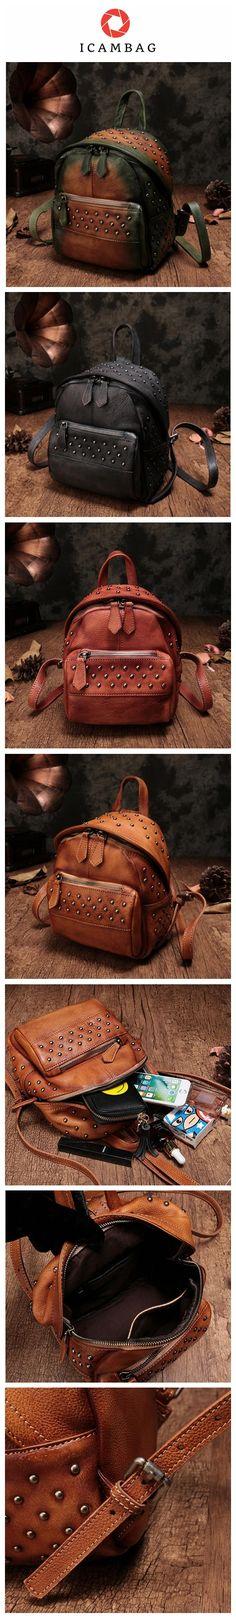 6a72e1291bbb Fashion Top Leather Handmade Rivet Soft Backpacks For Women